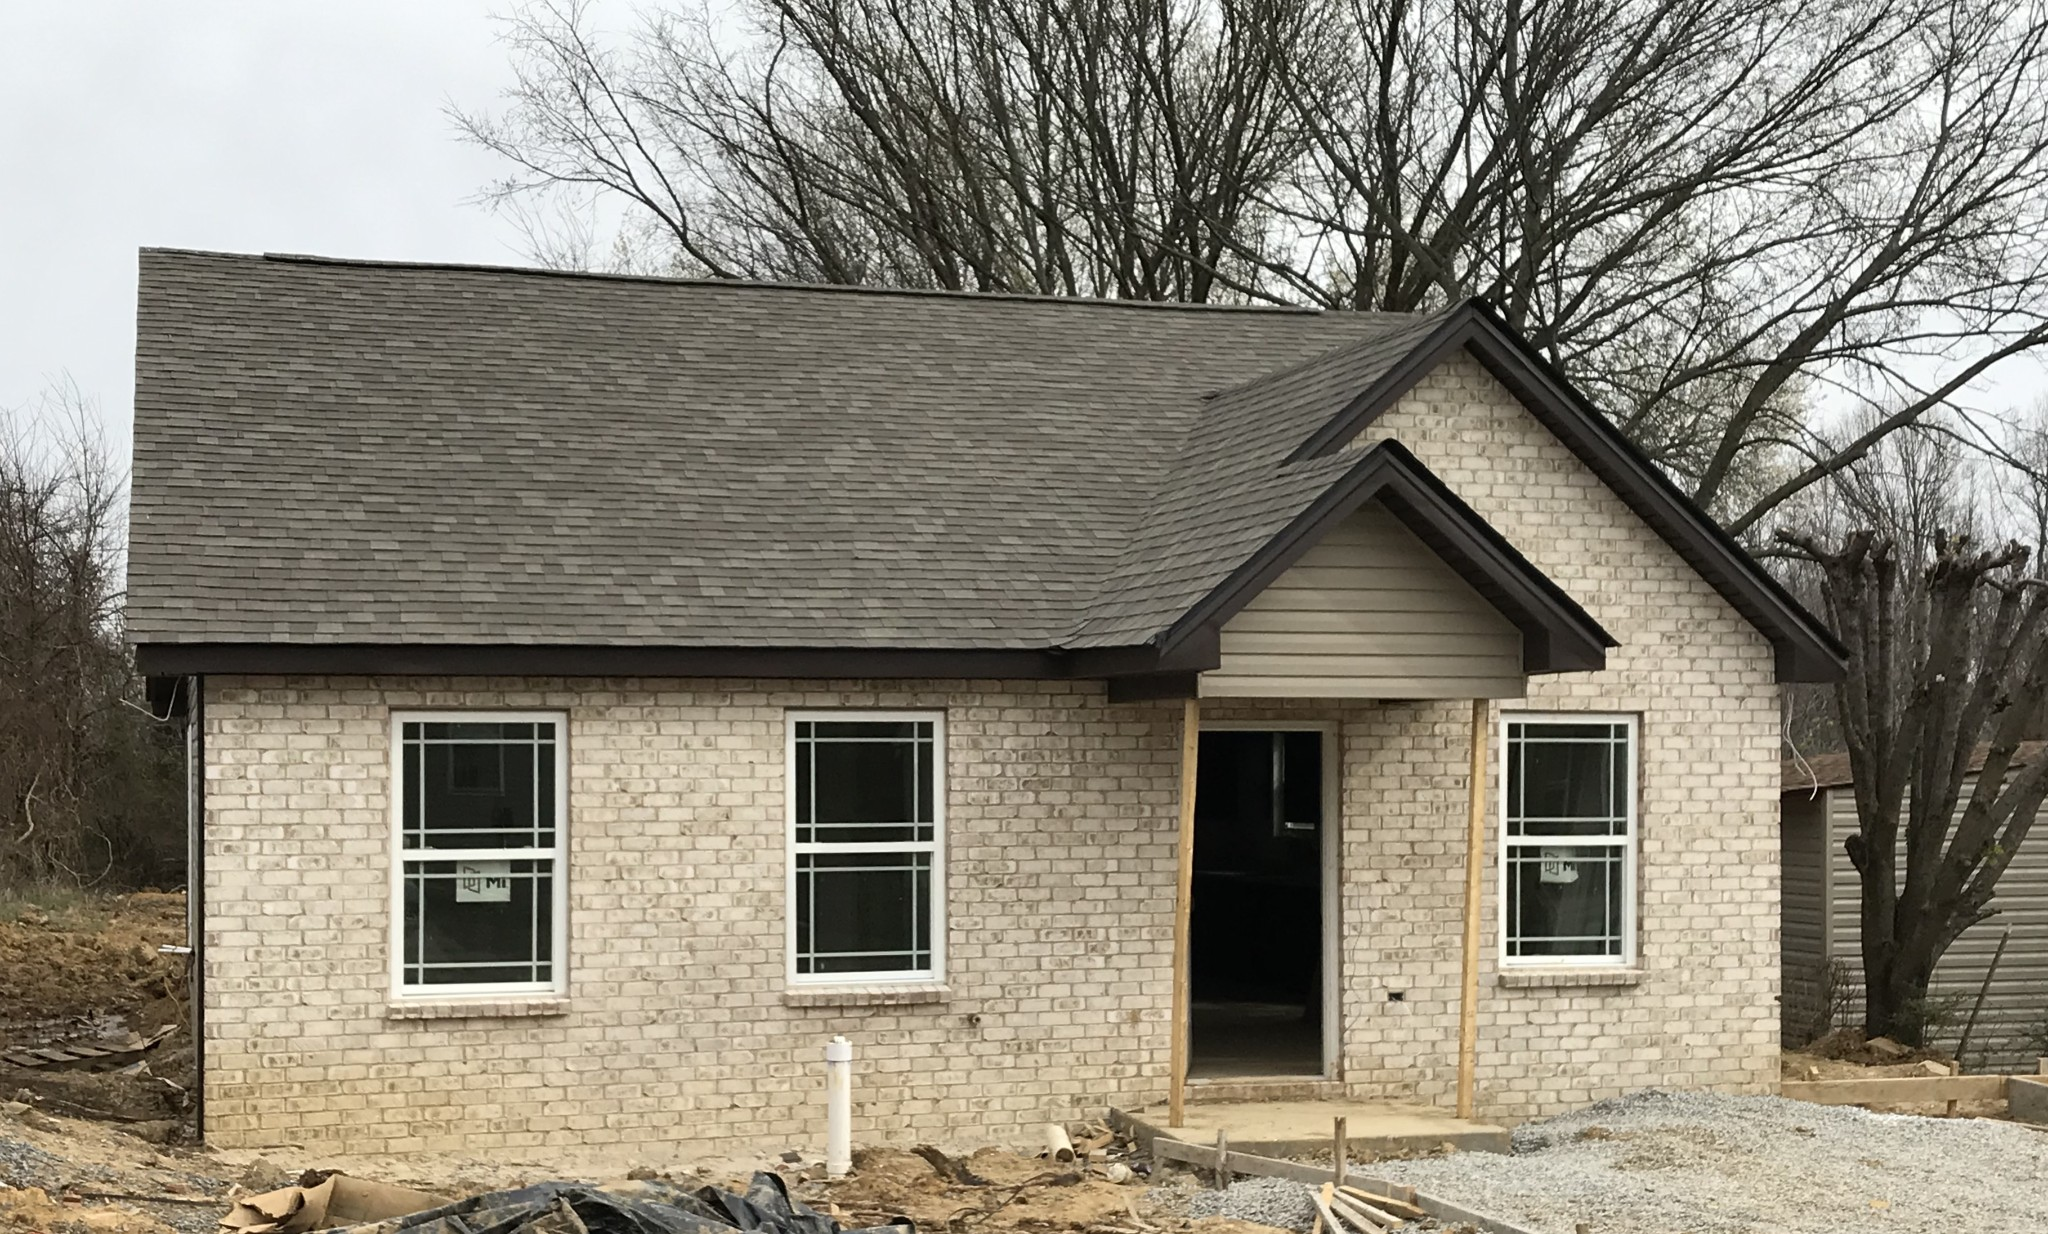 907 16th Ave, E, Springfield, TN 37172 - Springfield, TN real estate listing